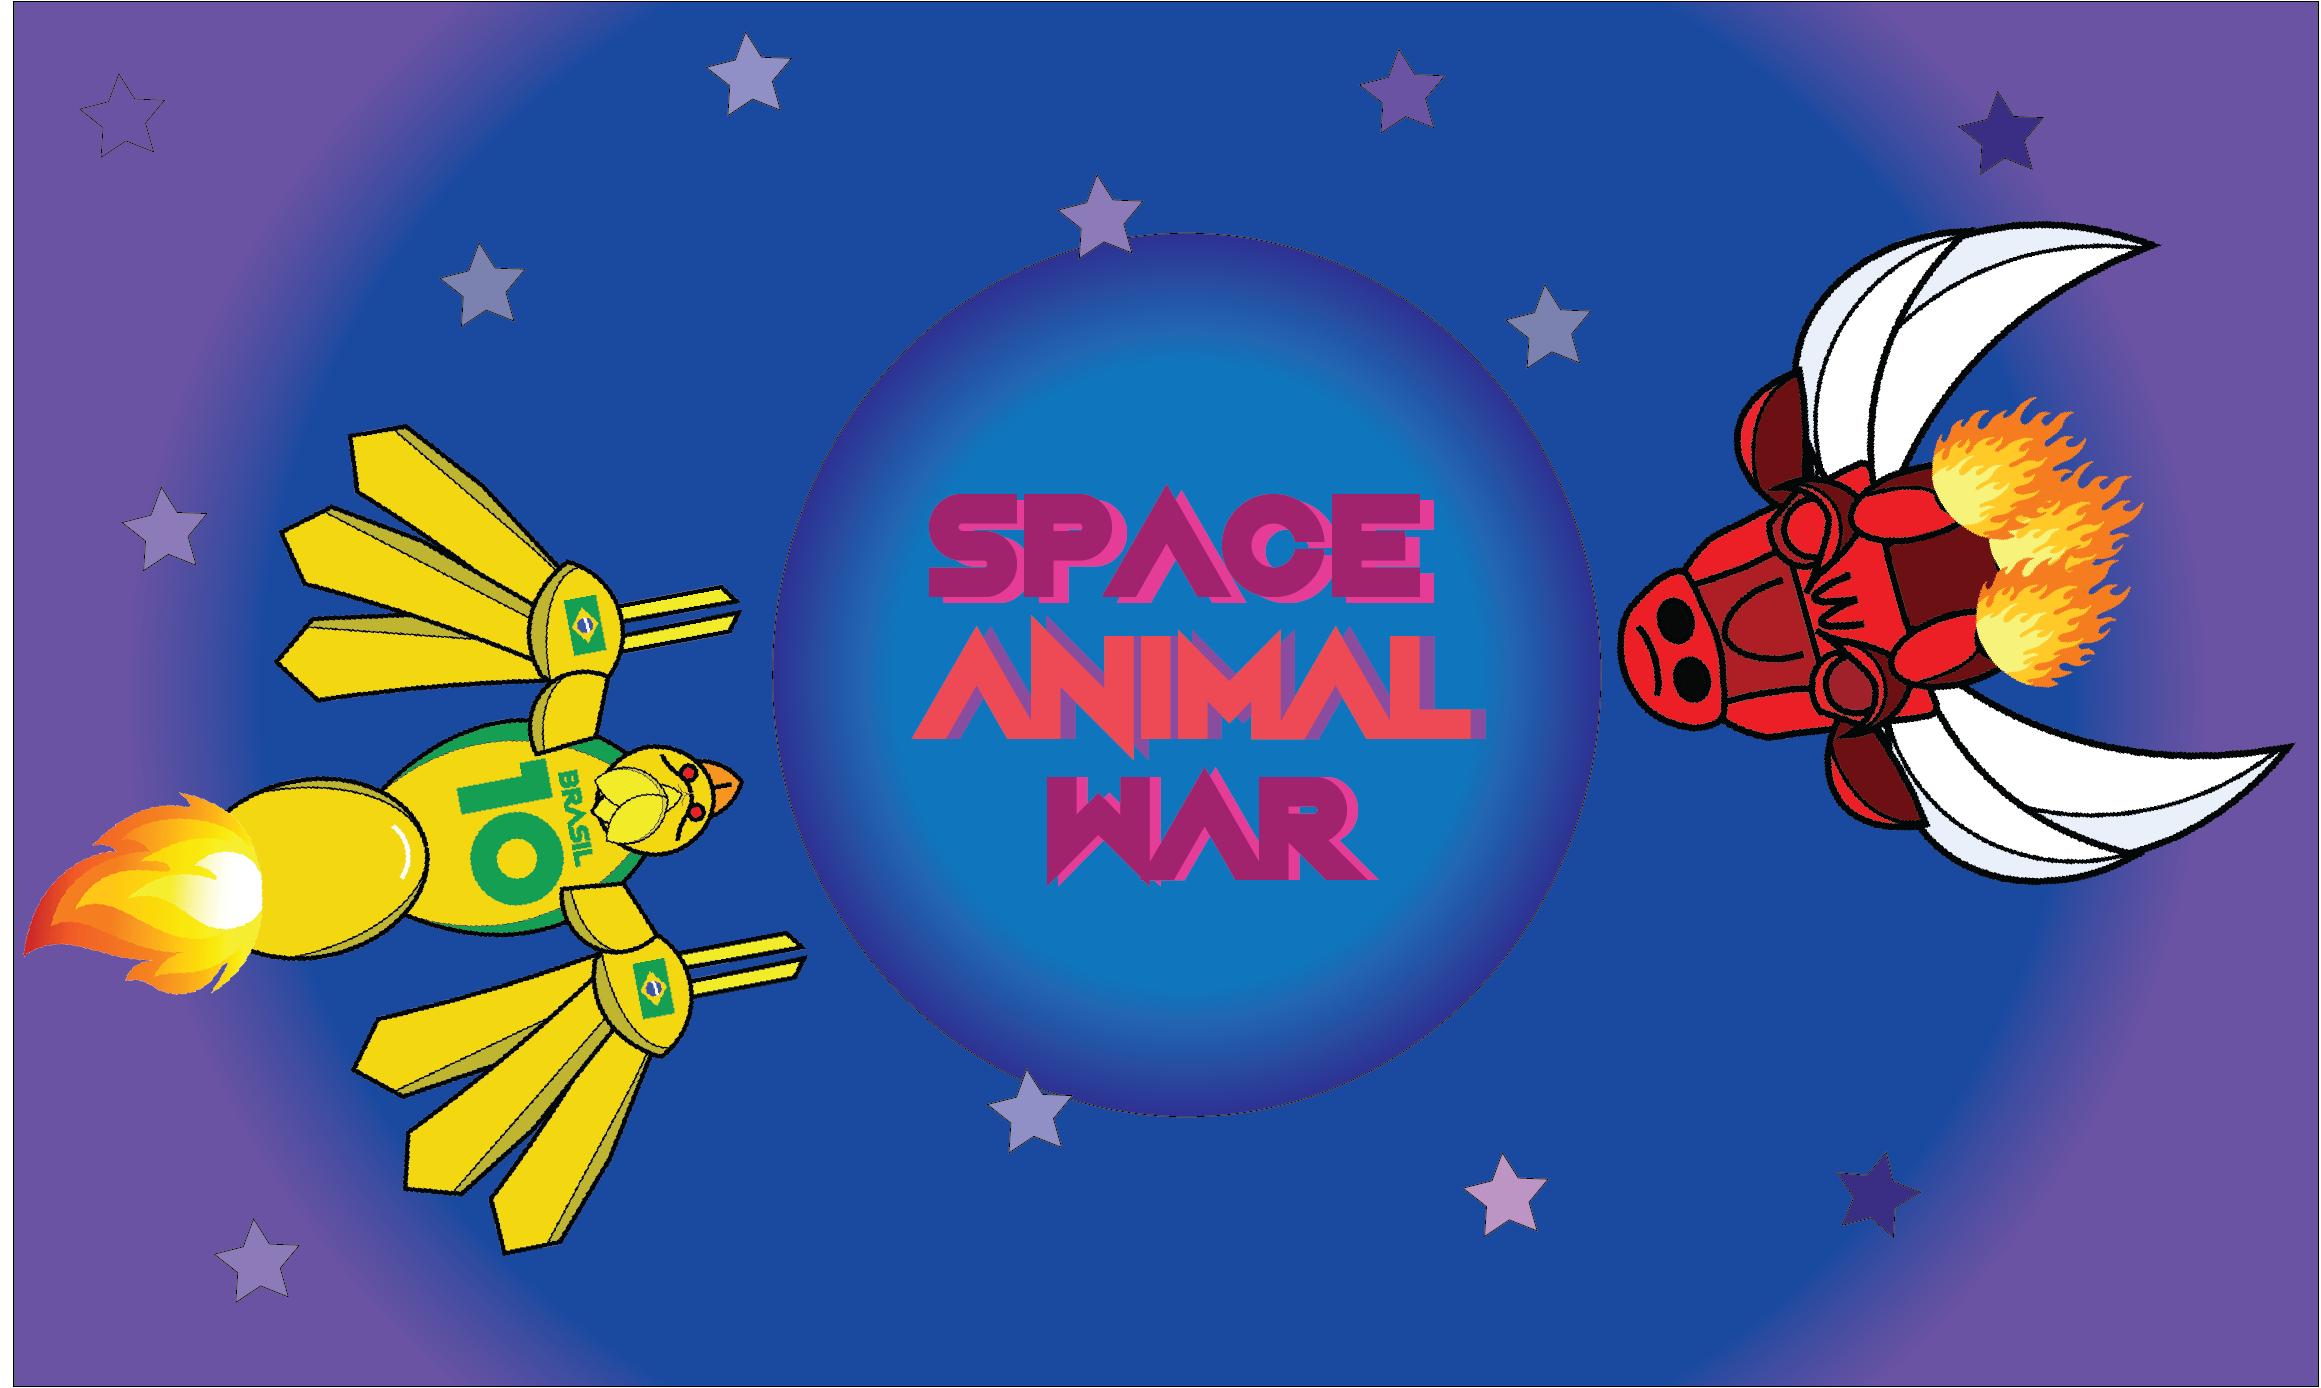 S.A.W - Space Animal War